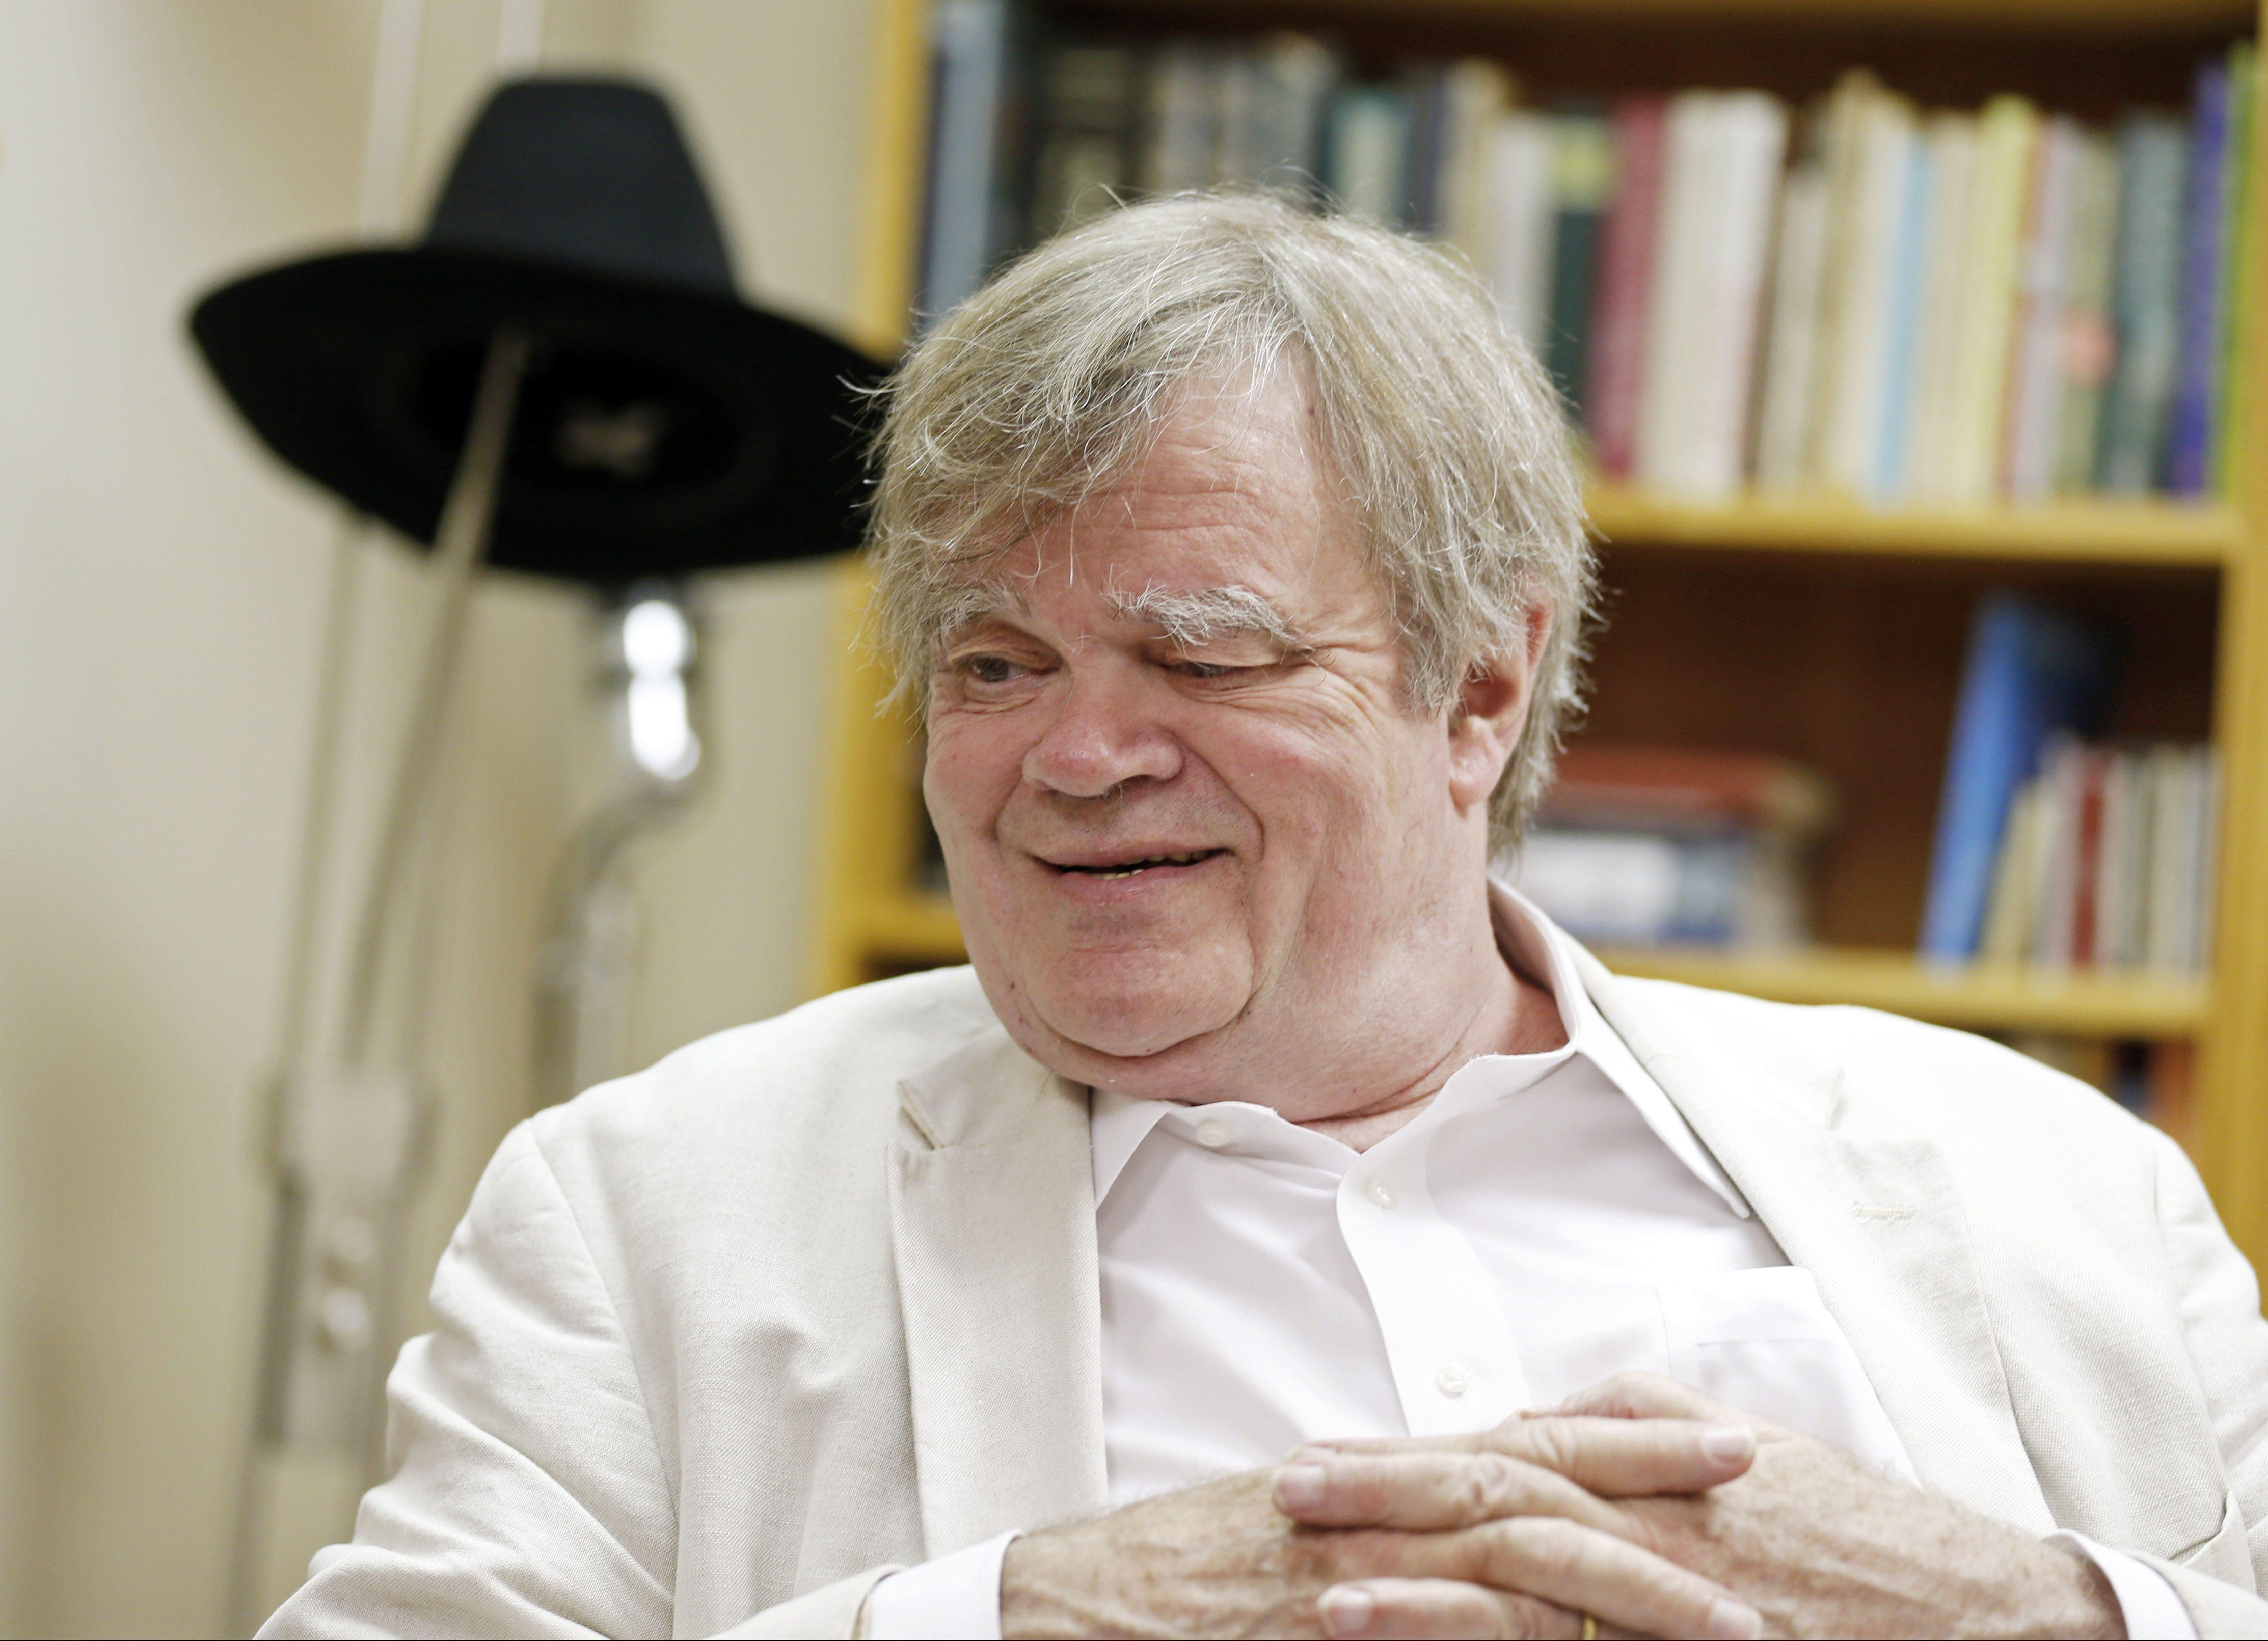 Garrison Keillor to Retire from Prairie Home panion